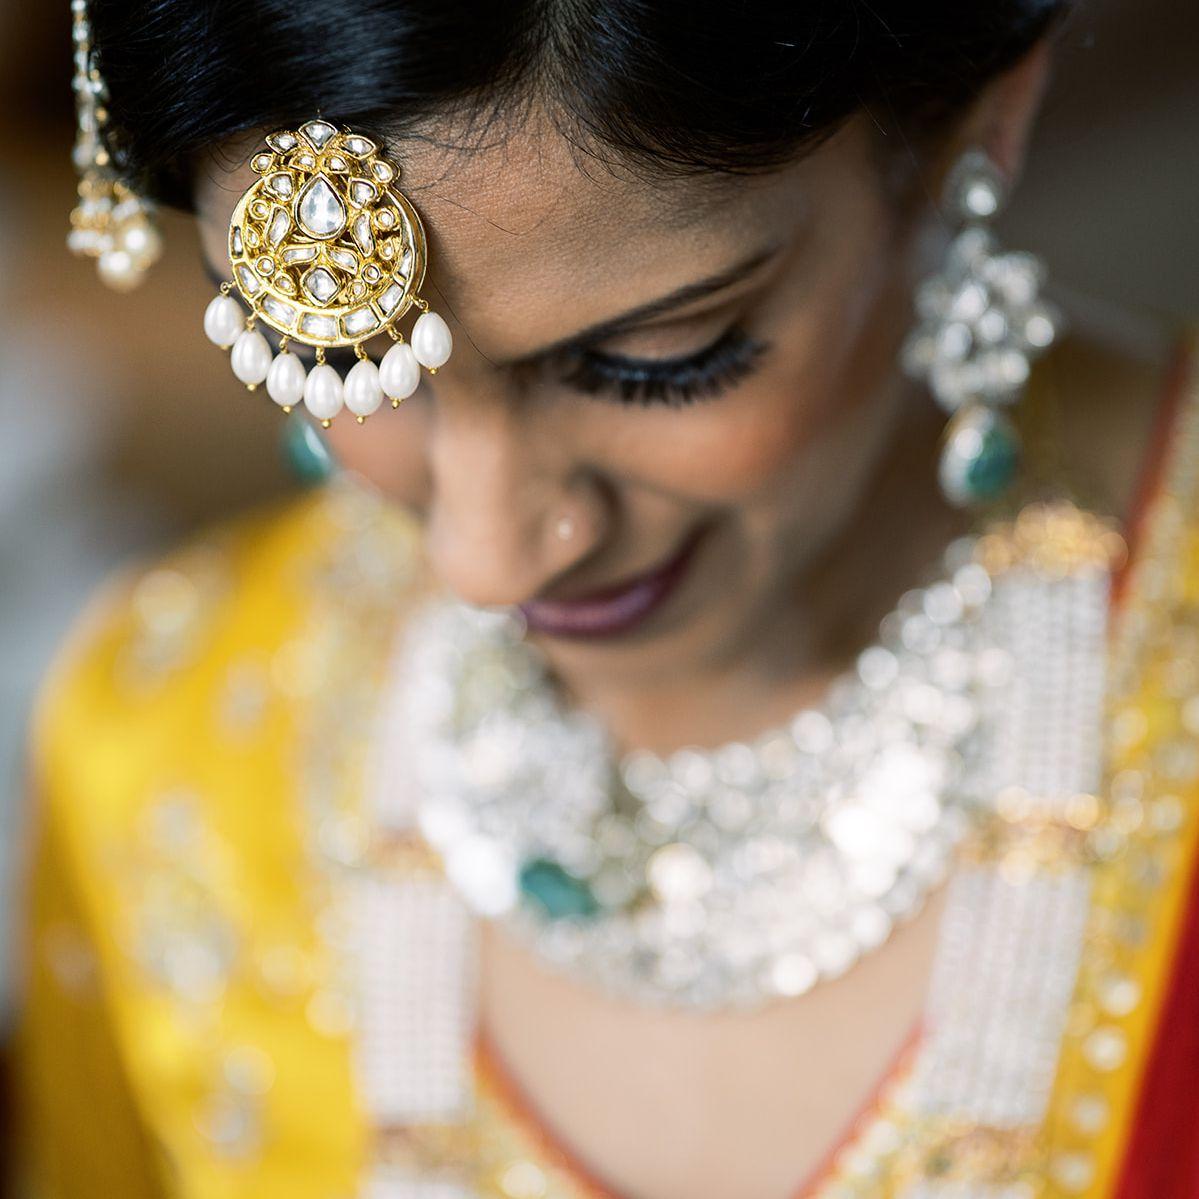 beauty shot of bride